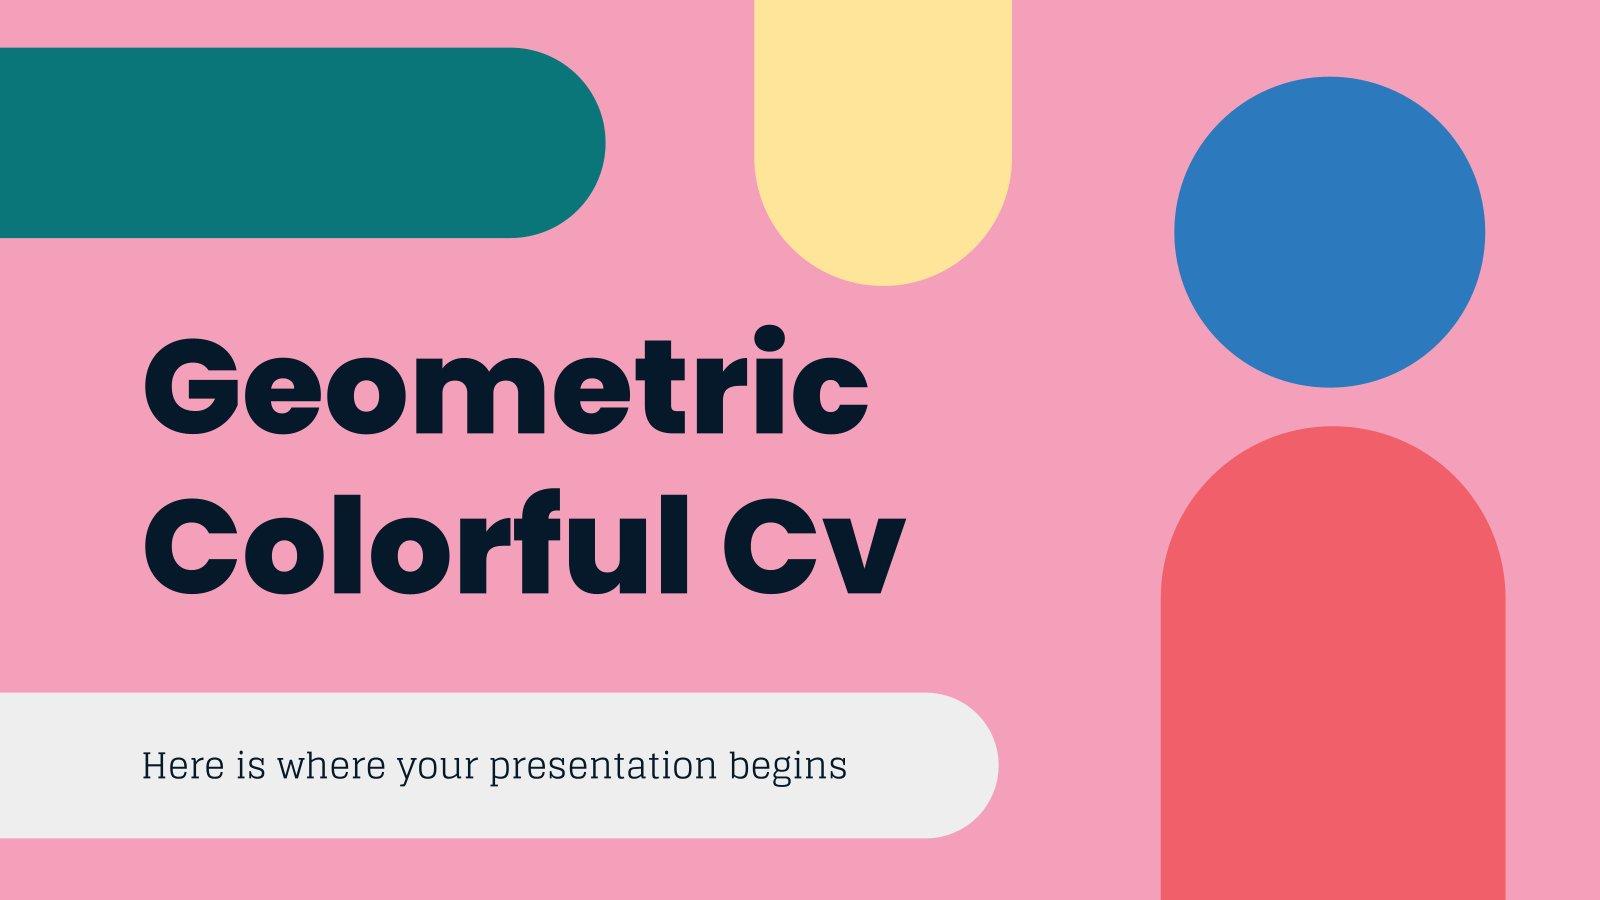 Geometrisch Buntes CV Präsentationsvorlage